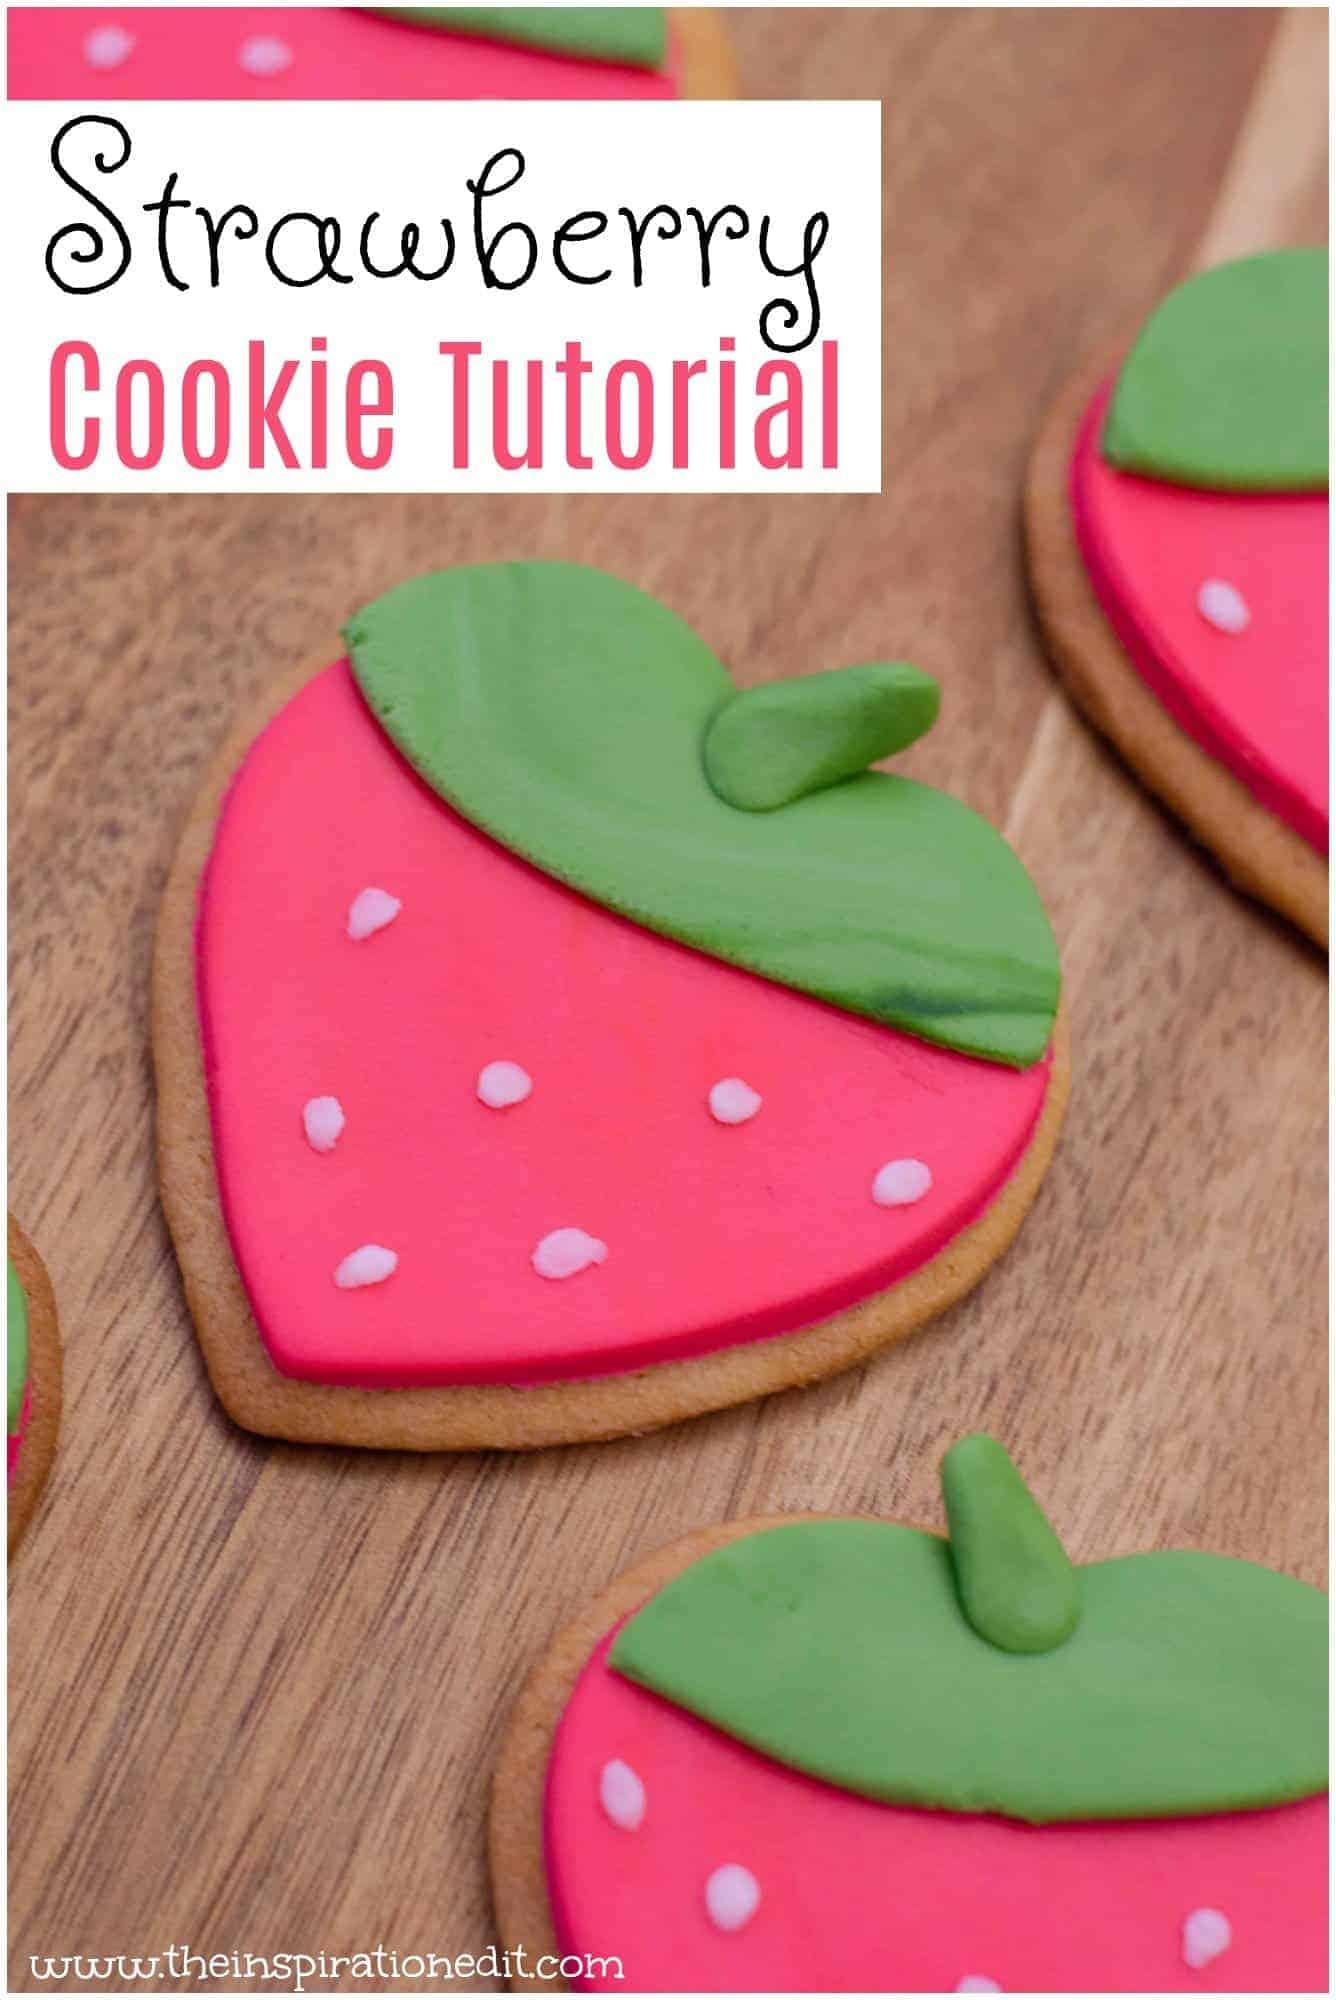 Strawberry cookies